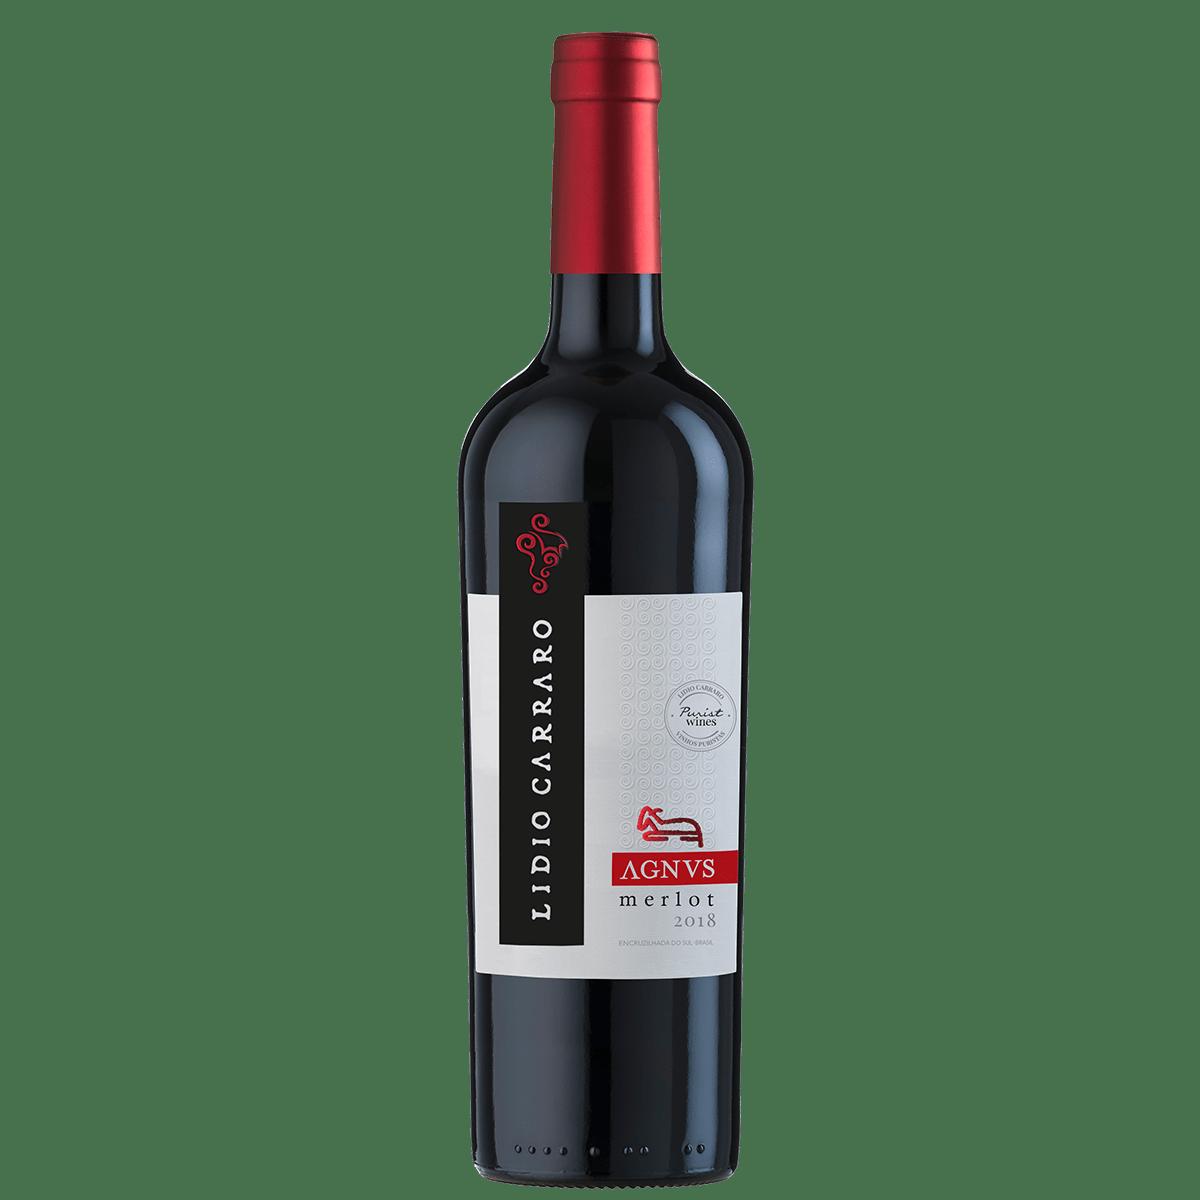 Vinho Lidio Carraro Agnus Merlot Tinto 750ml